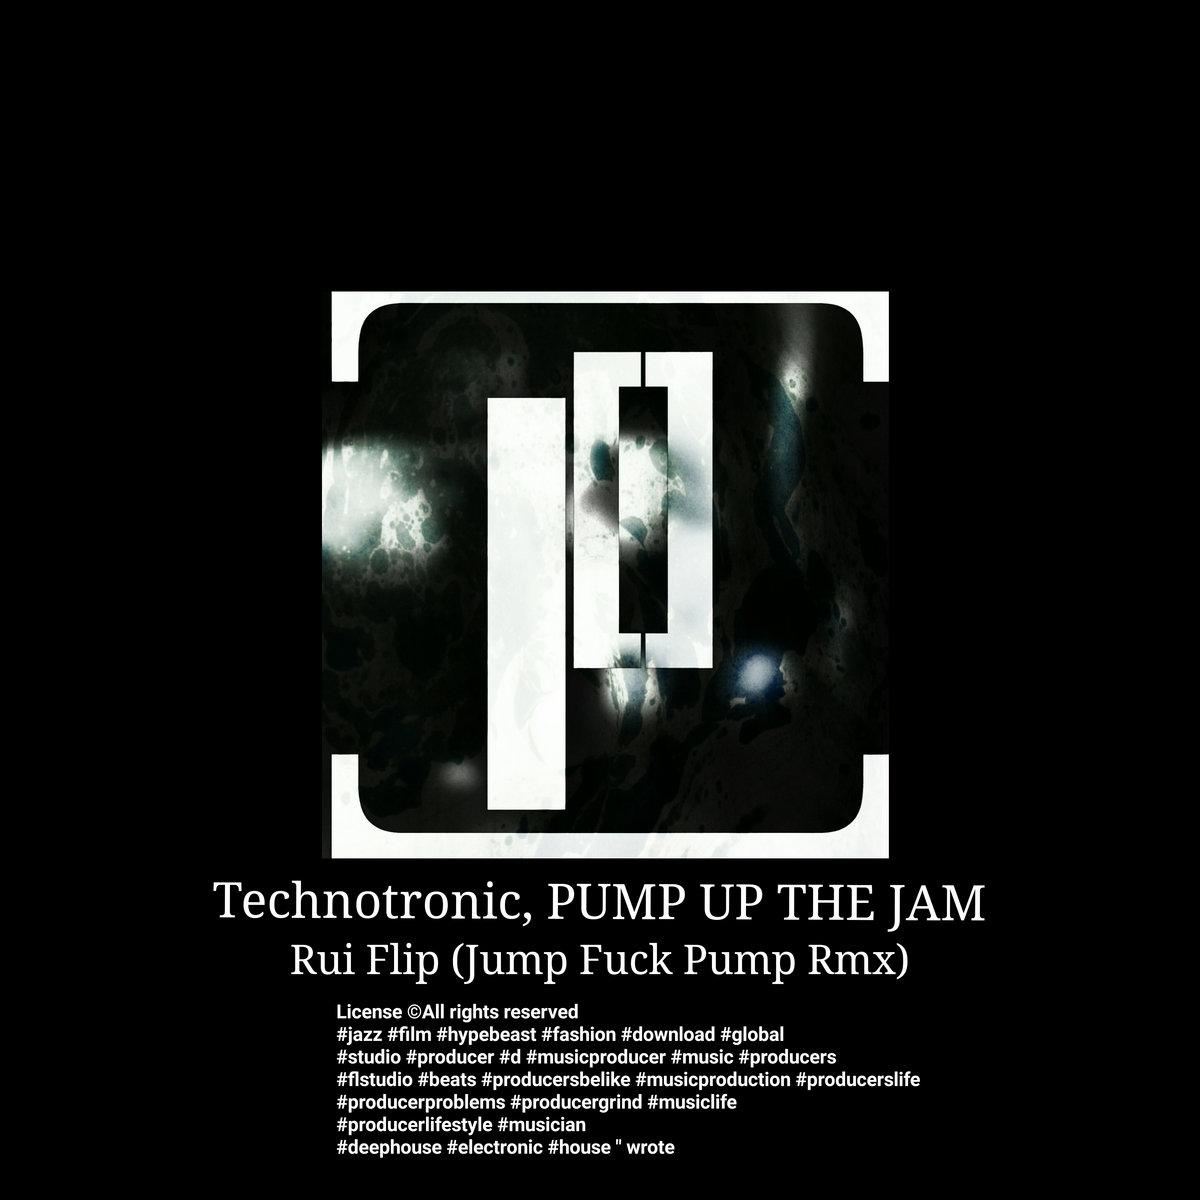 technotronic pump up the jam